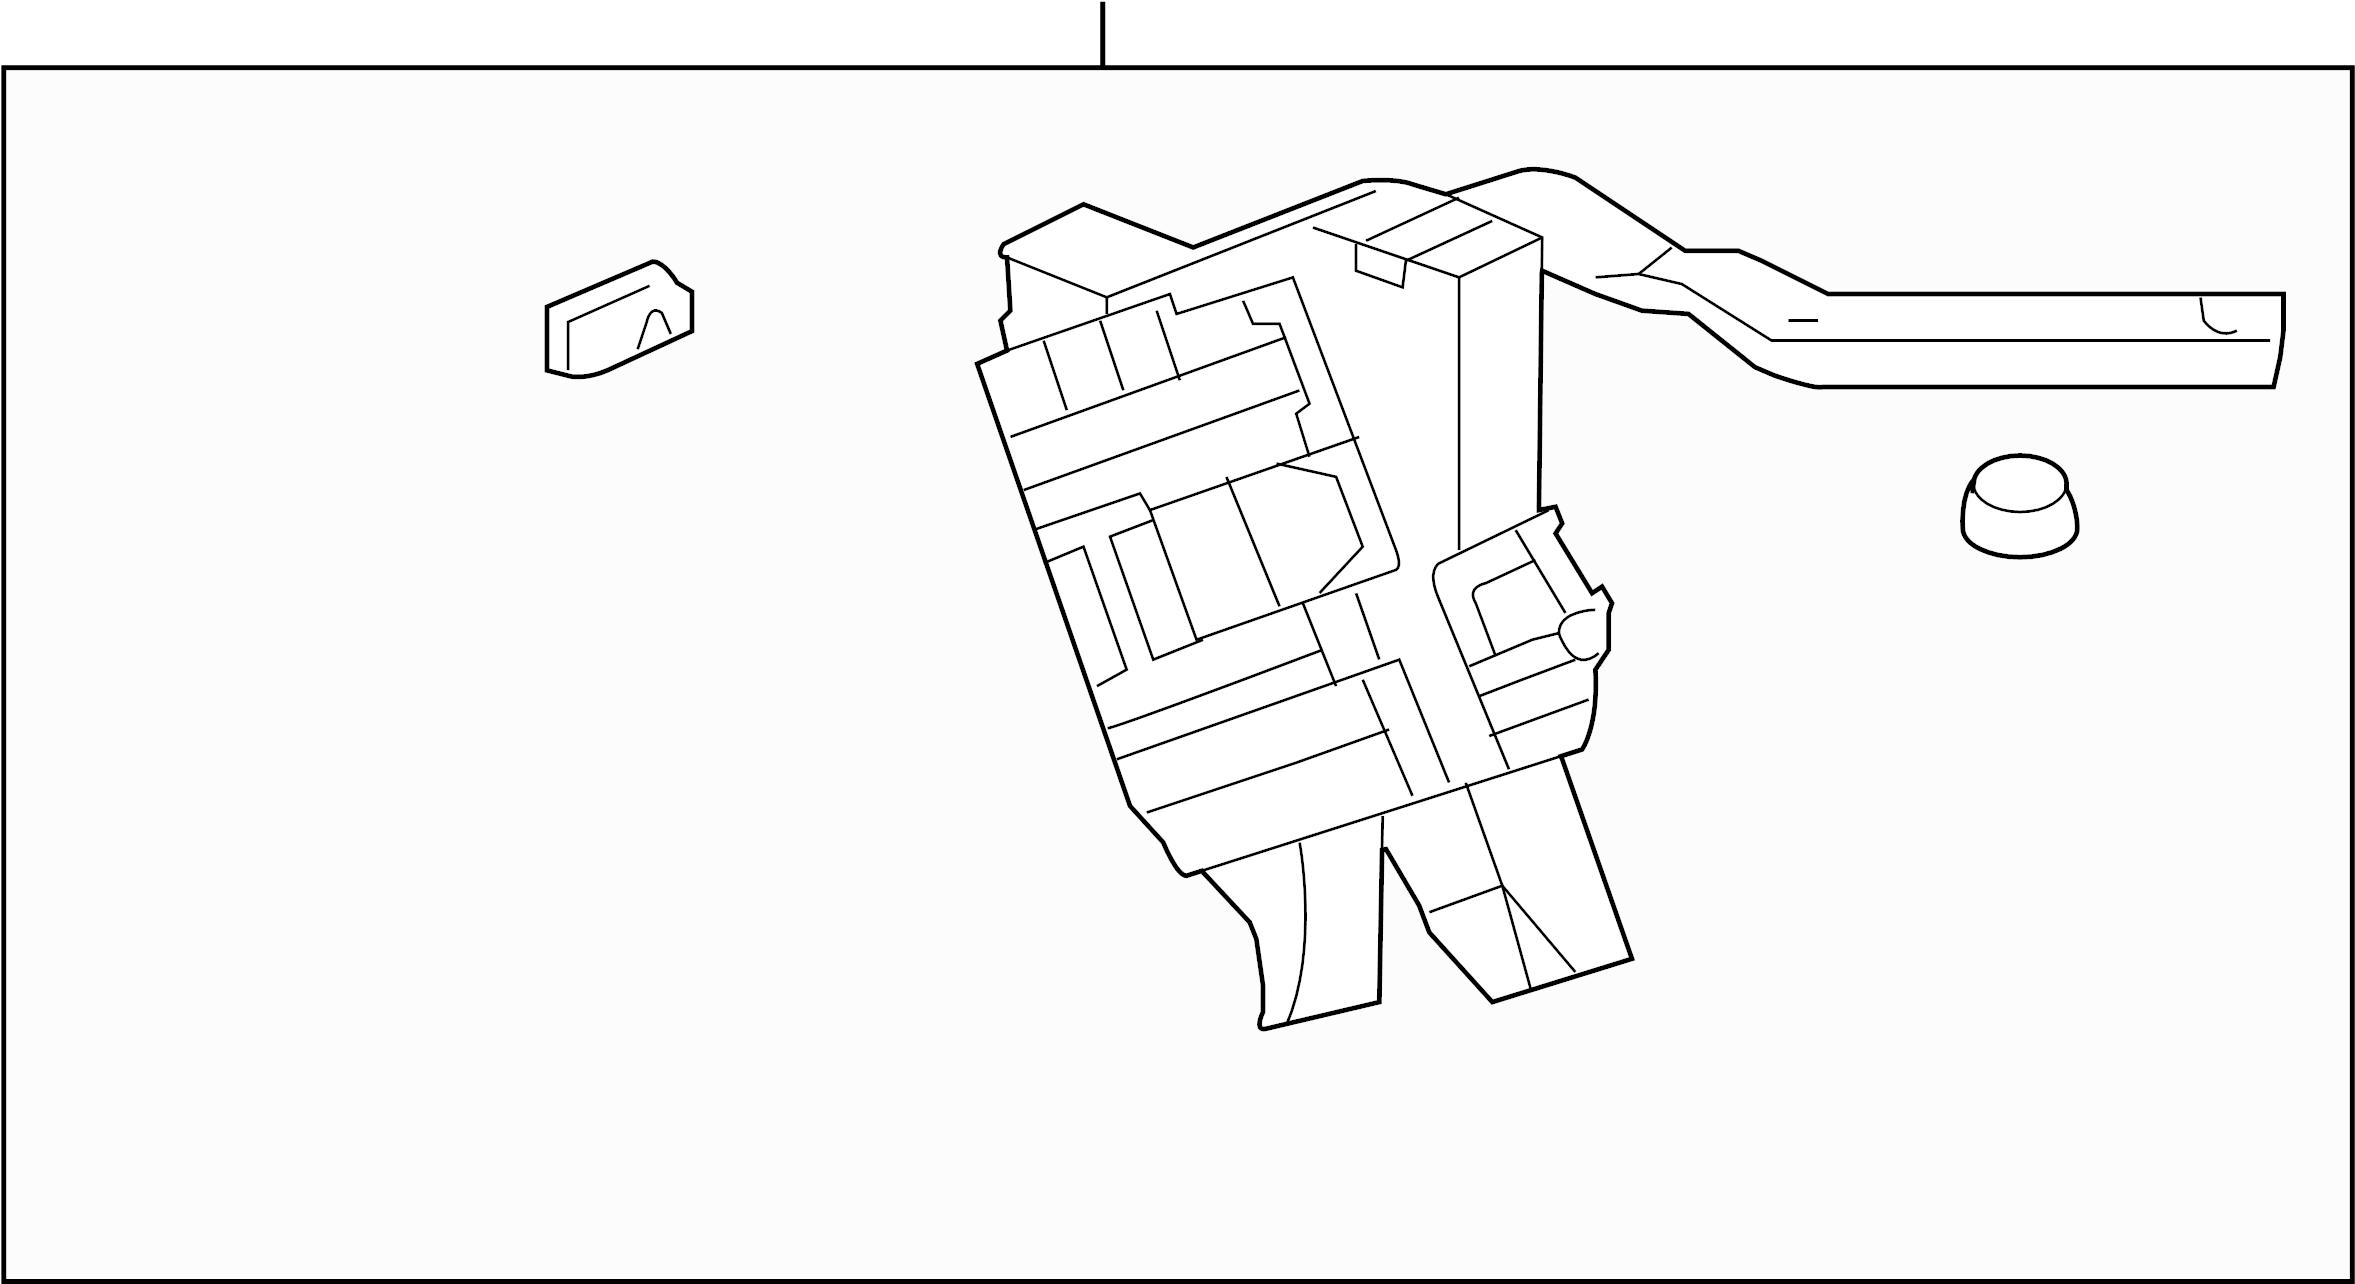 2002 pontiac montana radio wiring diagram pontiac montana sv6 block. block asm-i/p wrg harn junc ...